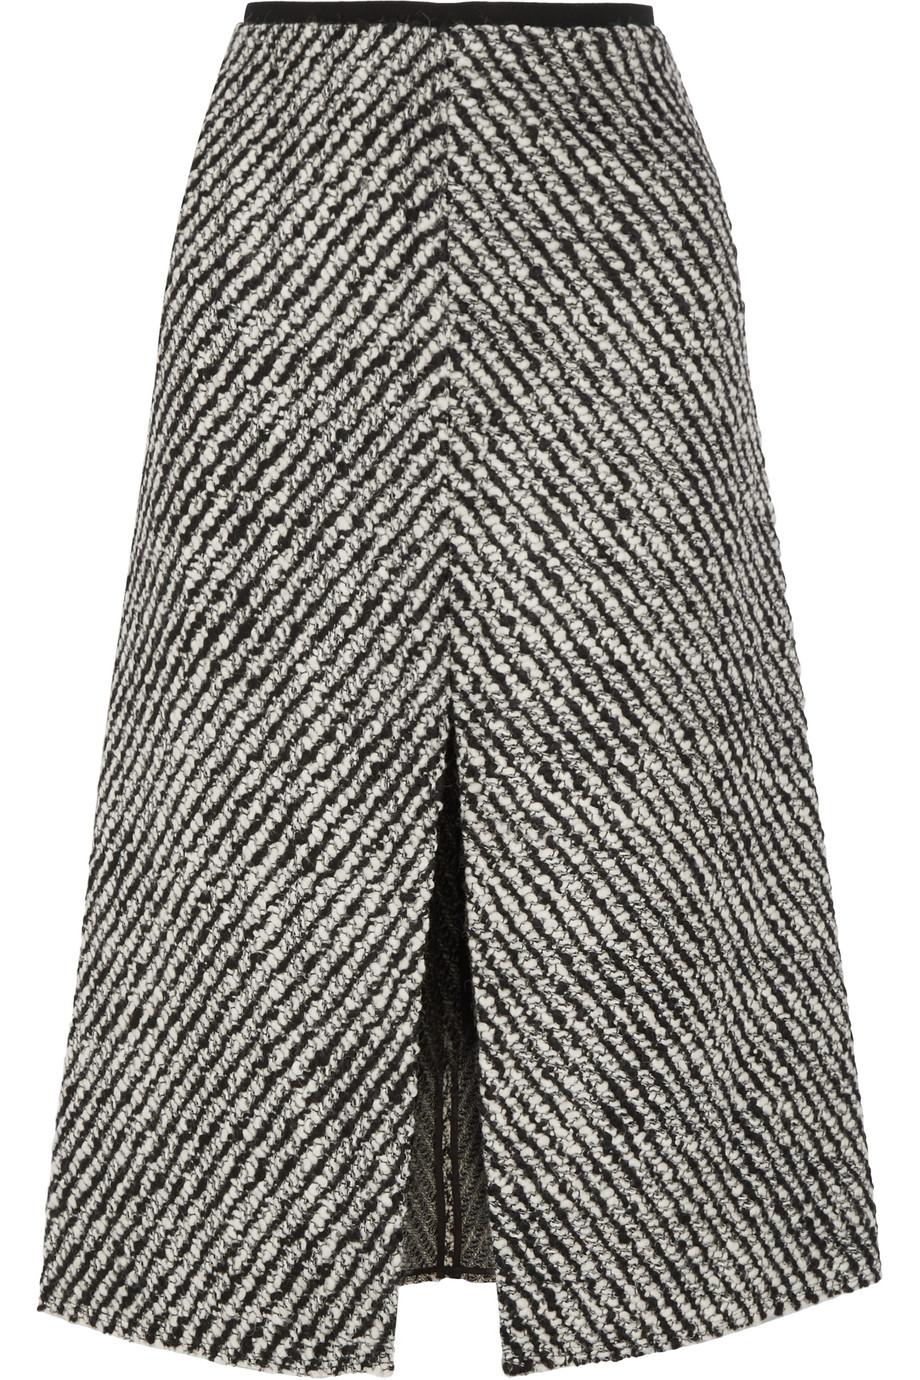 Isabel Marant Inko Tweed Skirt, Black, Women's, Size: 34